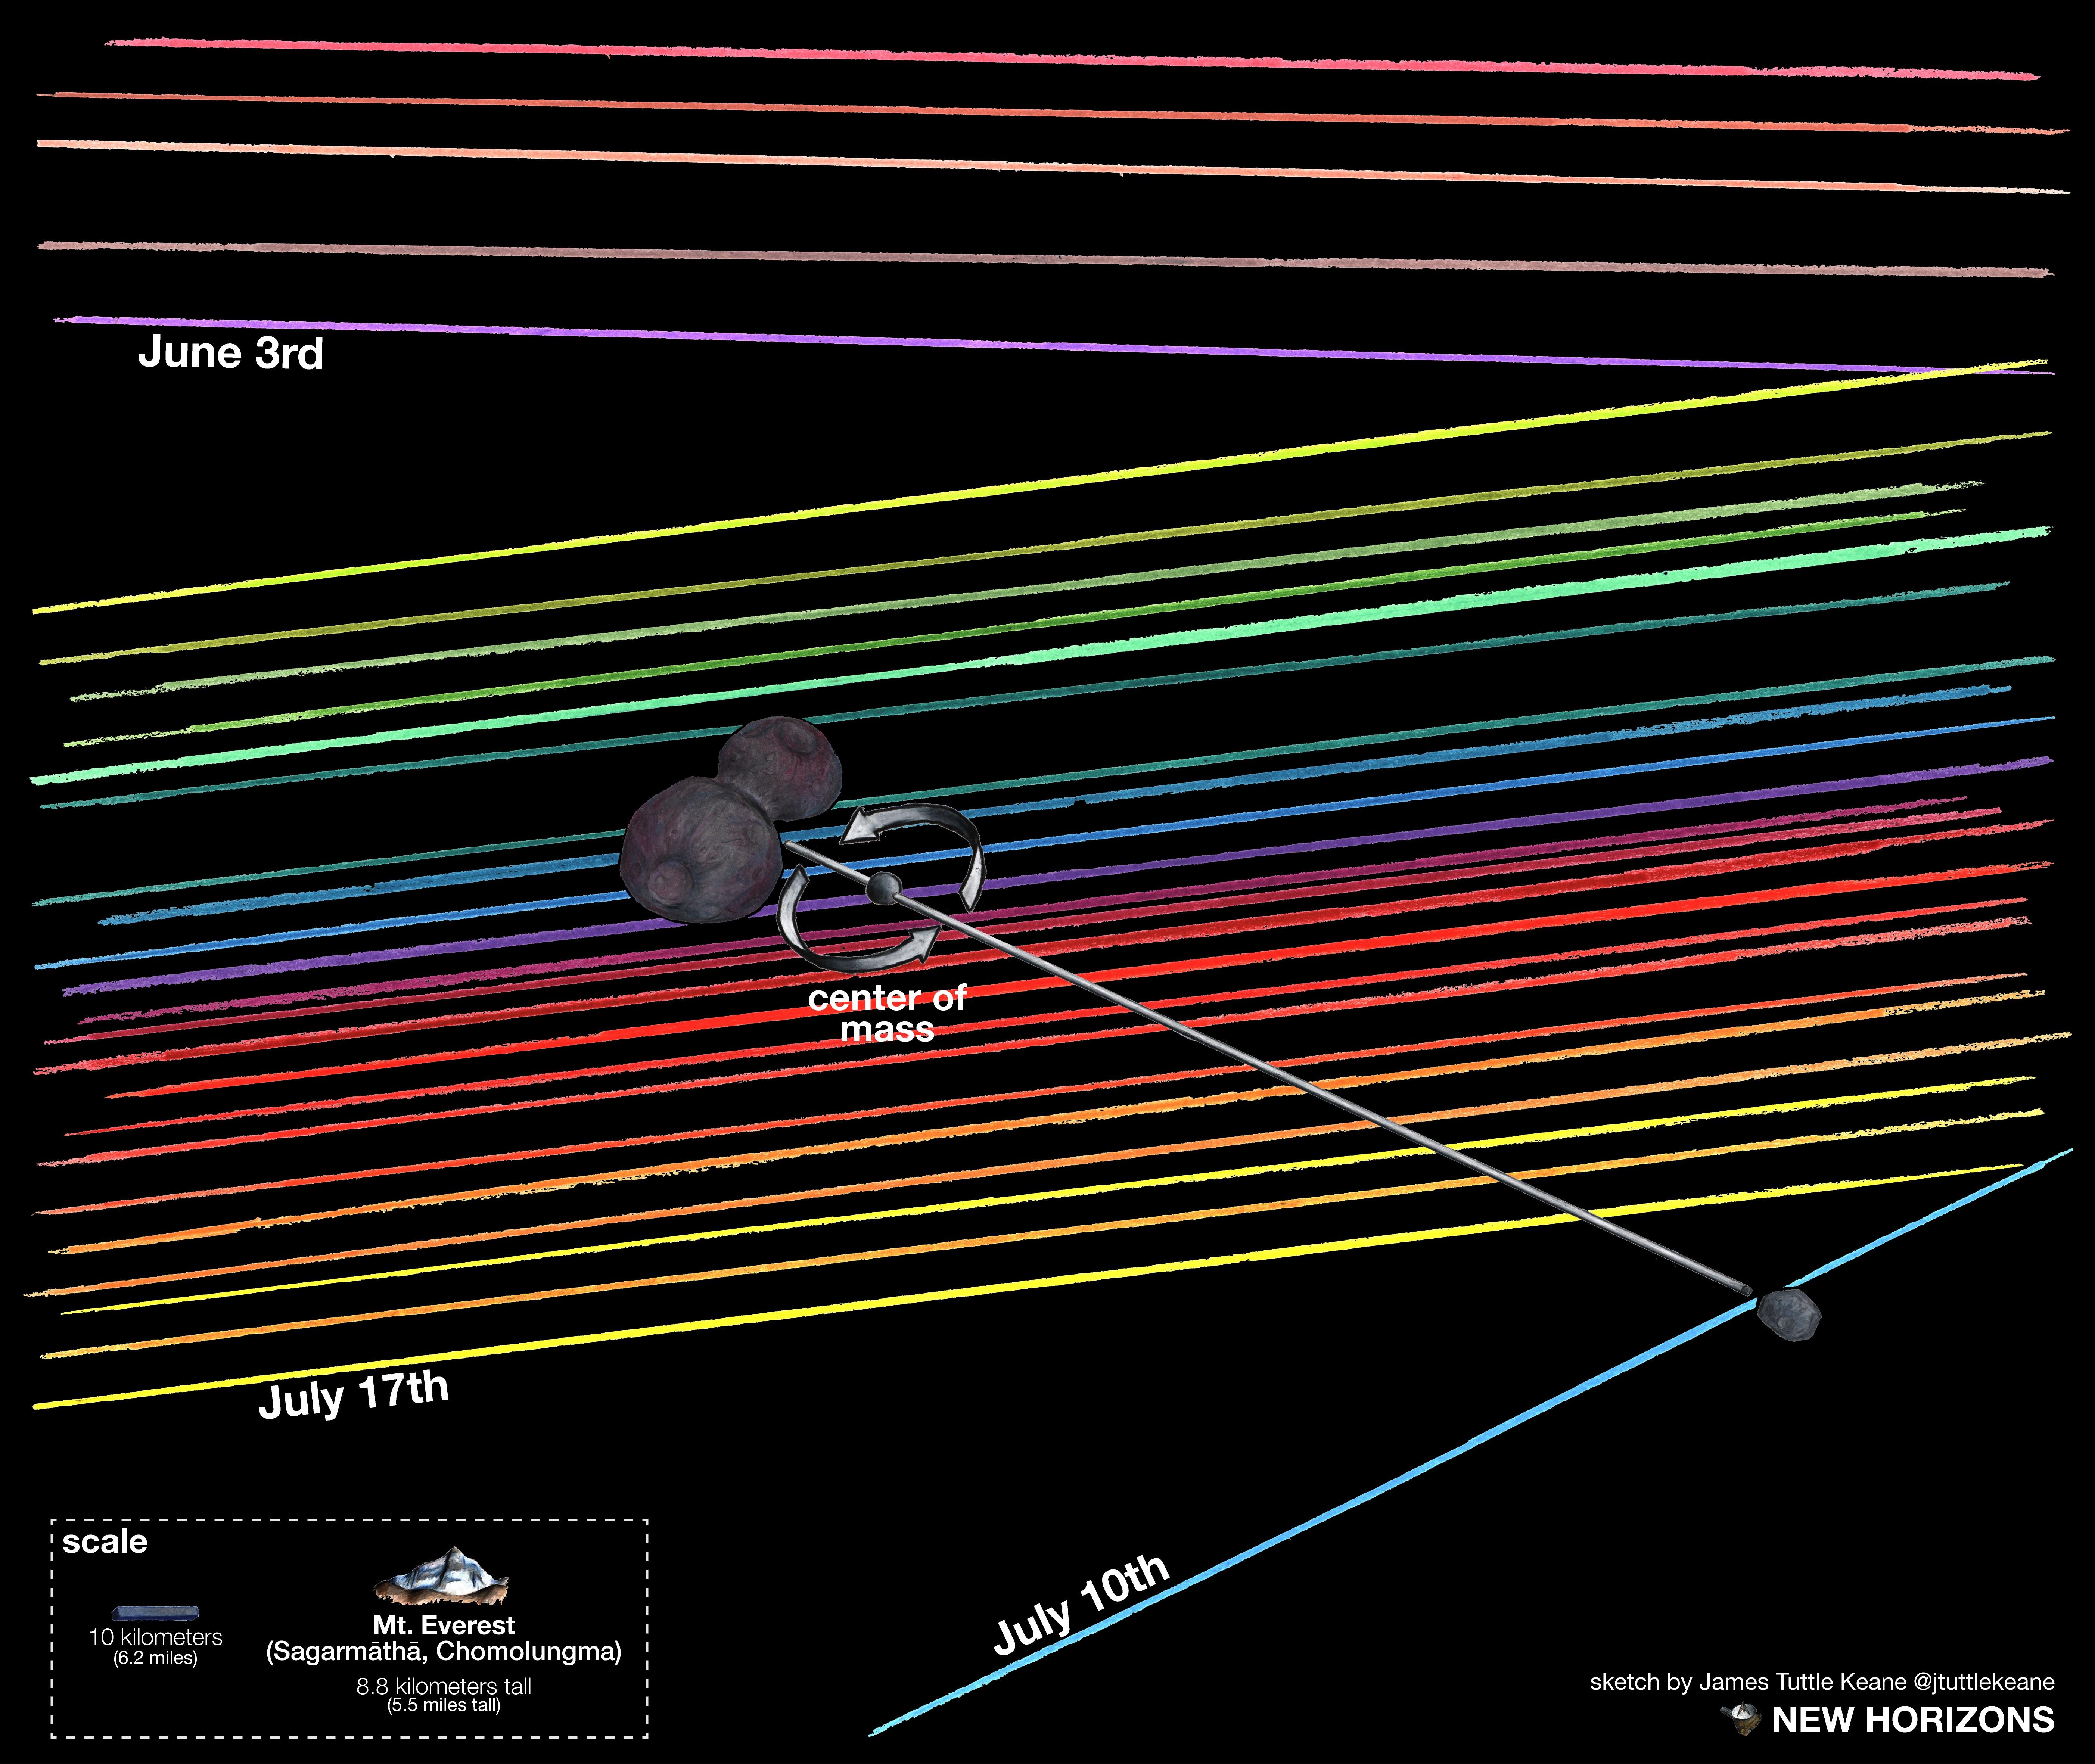 MU69 Occultation Interpretation